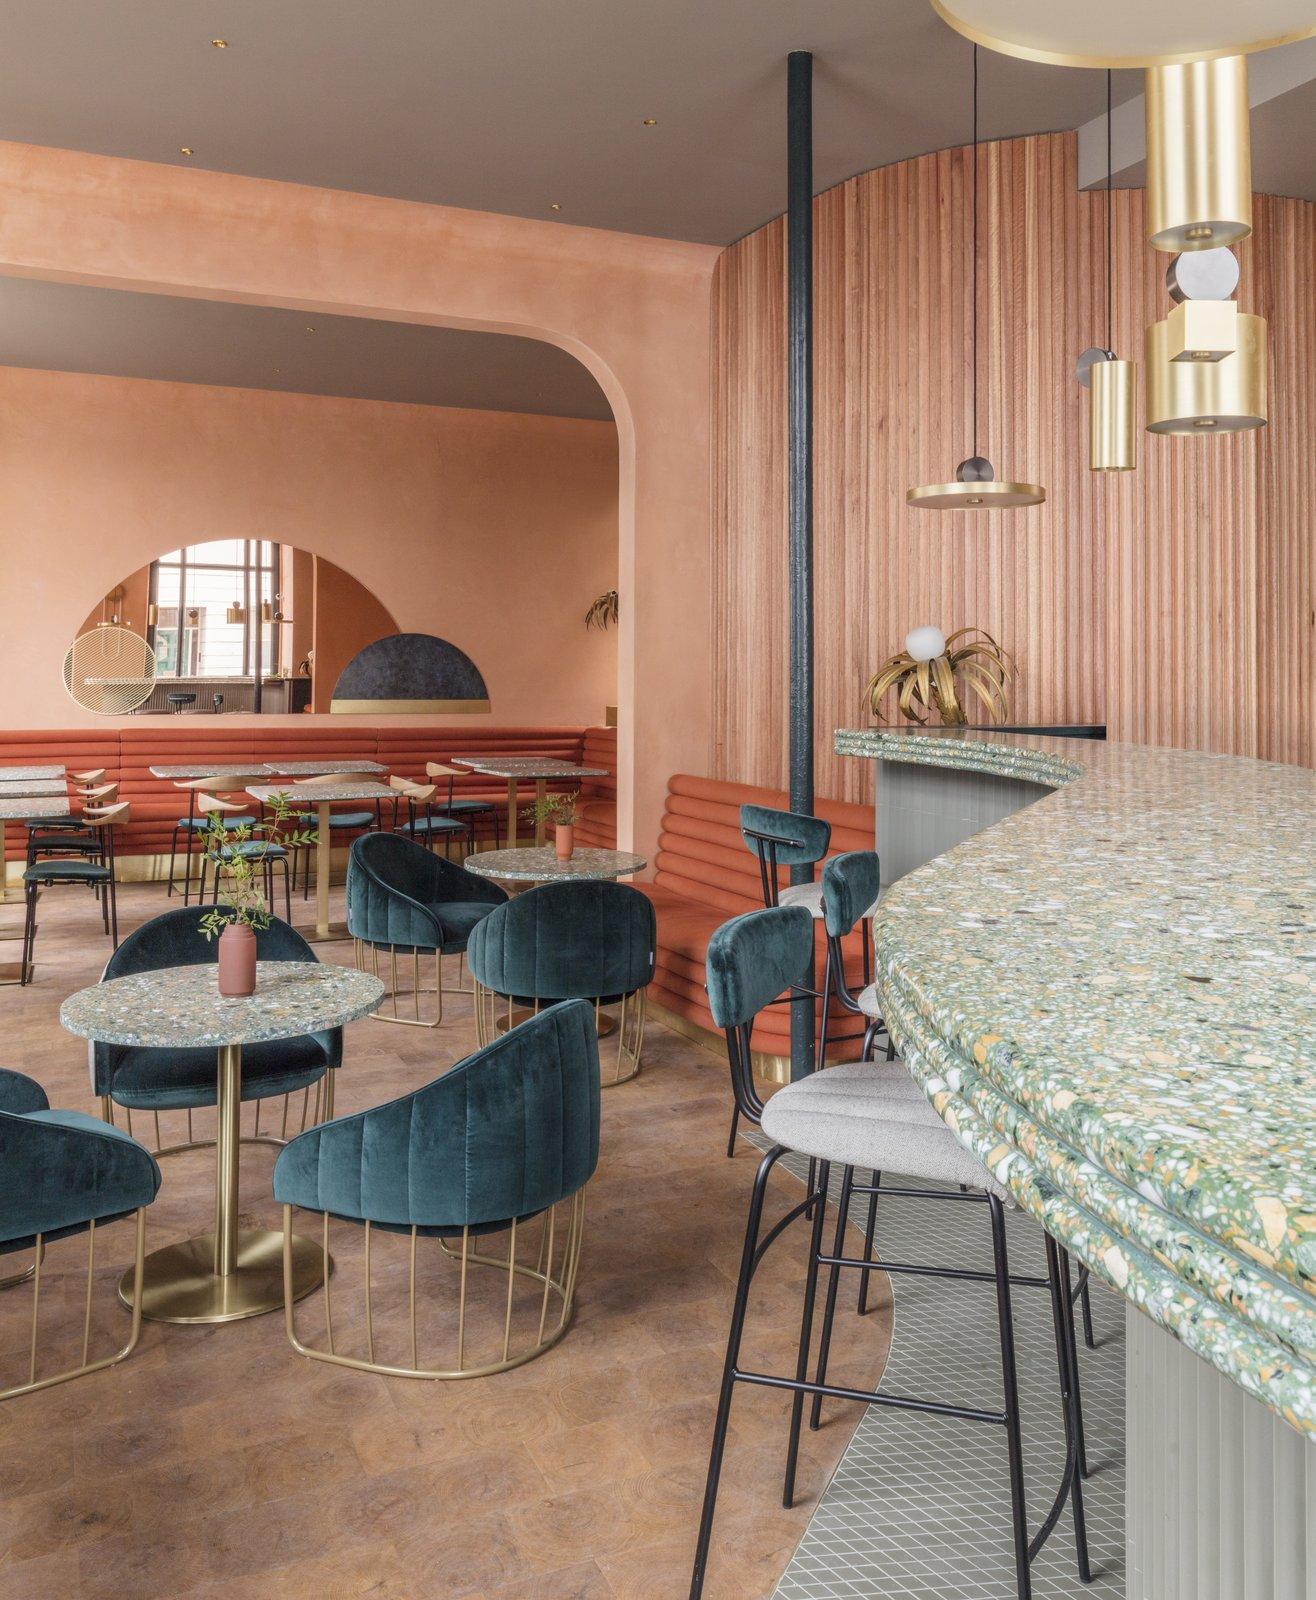 The menu features creations from Mallorcan-born Michelin-kitchen veteran chef Vicente Fortea.